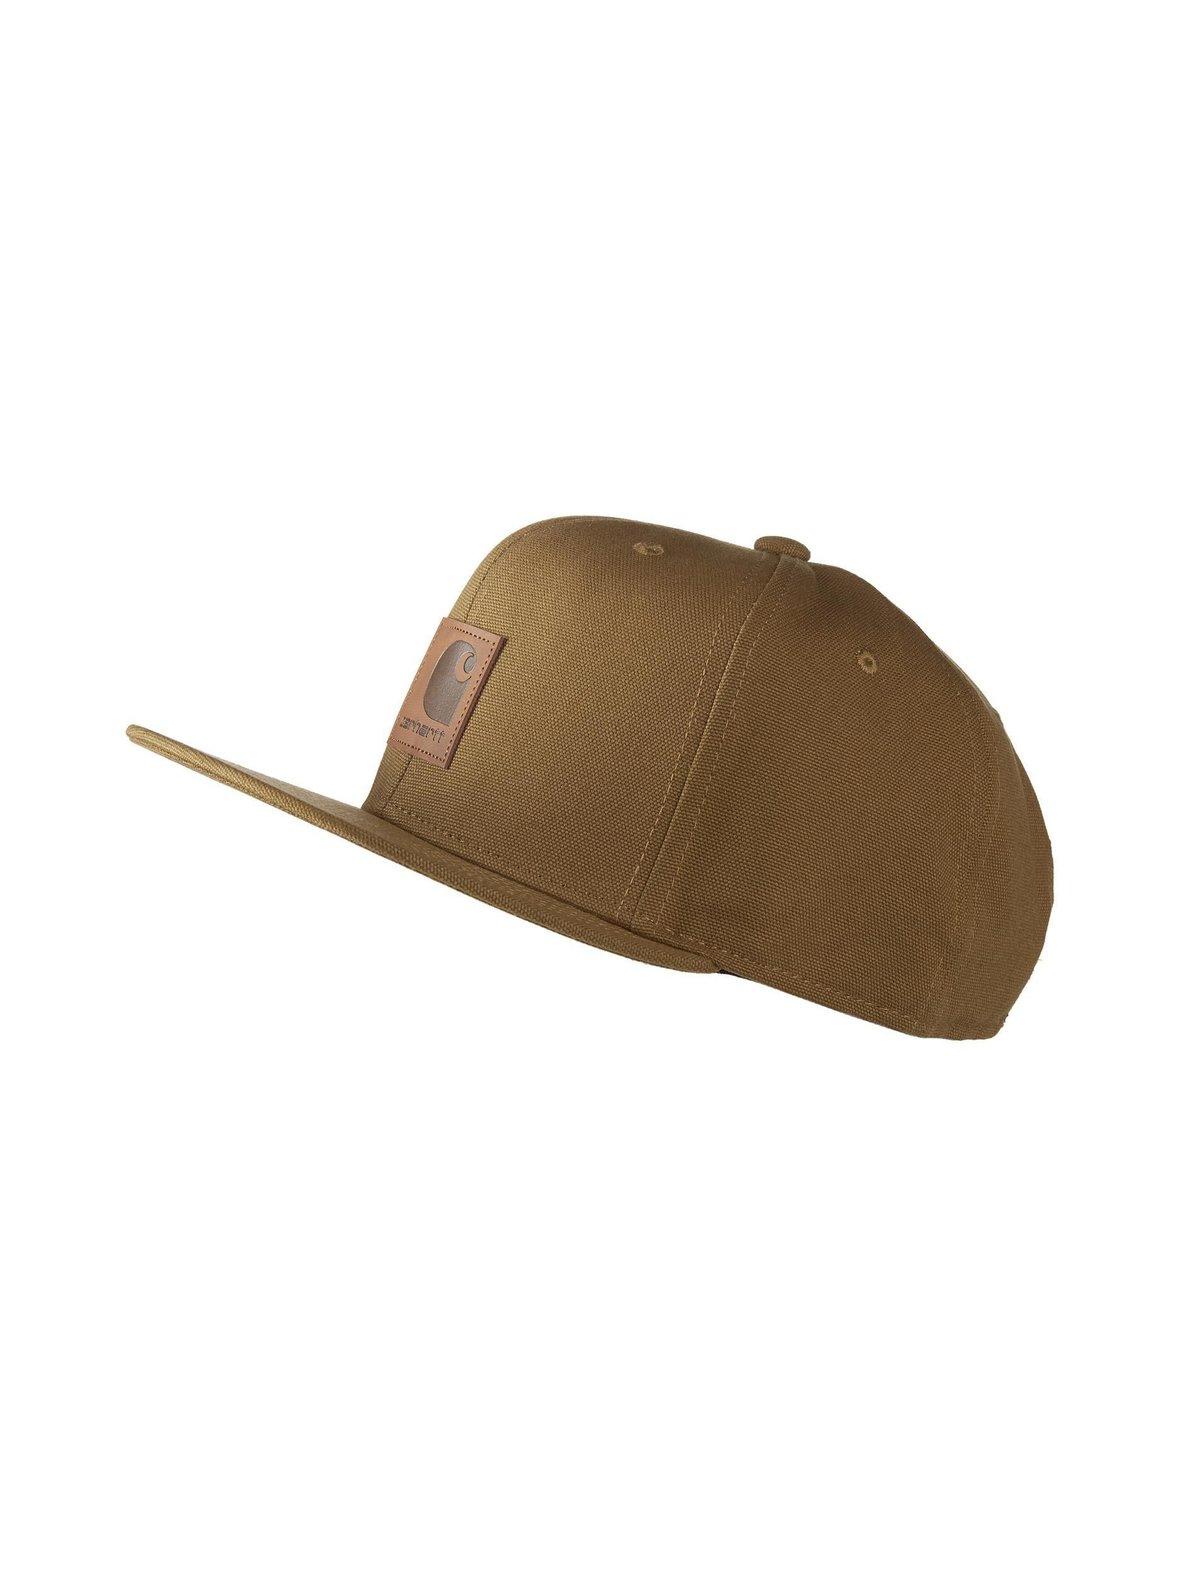 Hamilton Brown (ruskea) Carhartt I023099 01 Logo Cap -lippalakki ... 7eb2283e6f